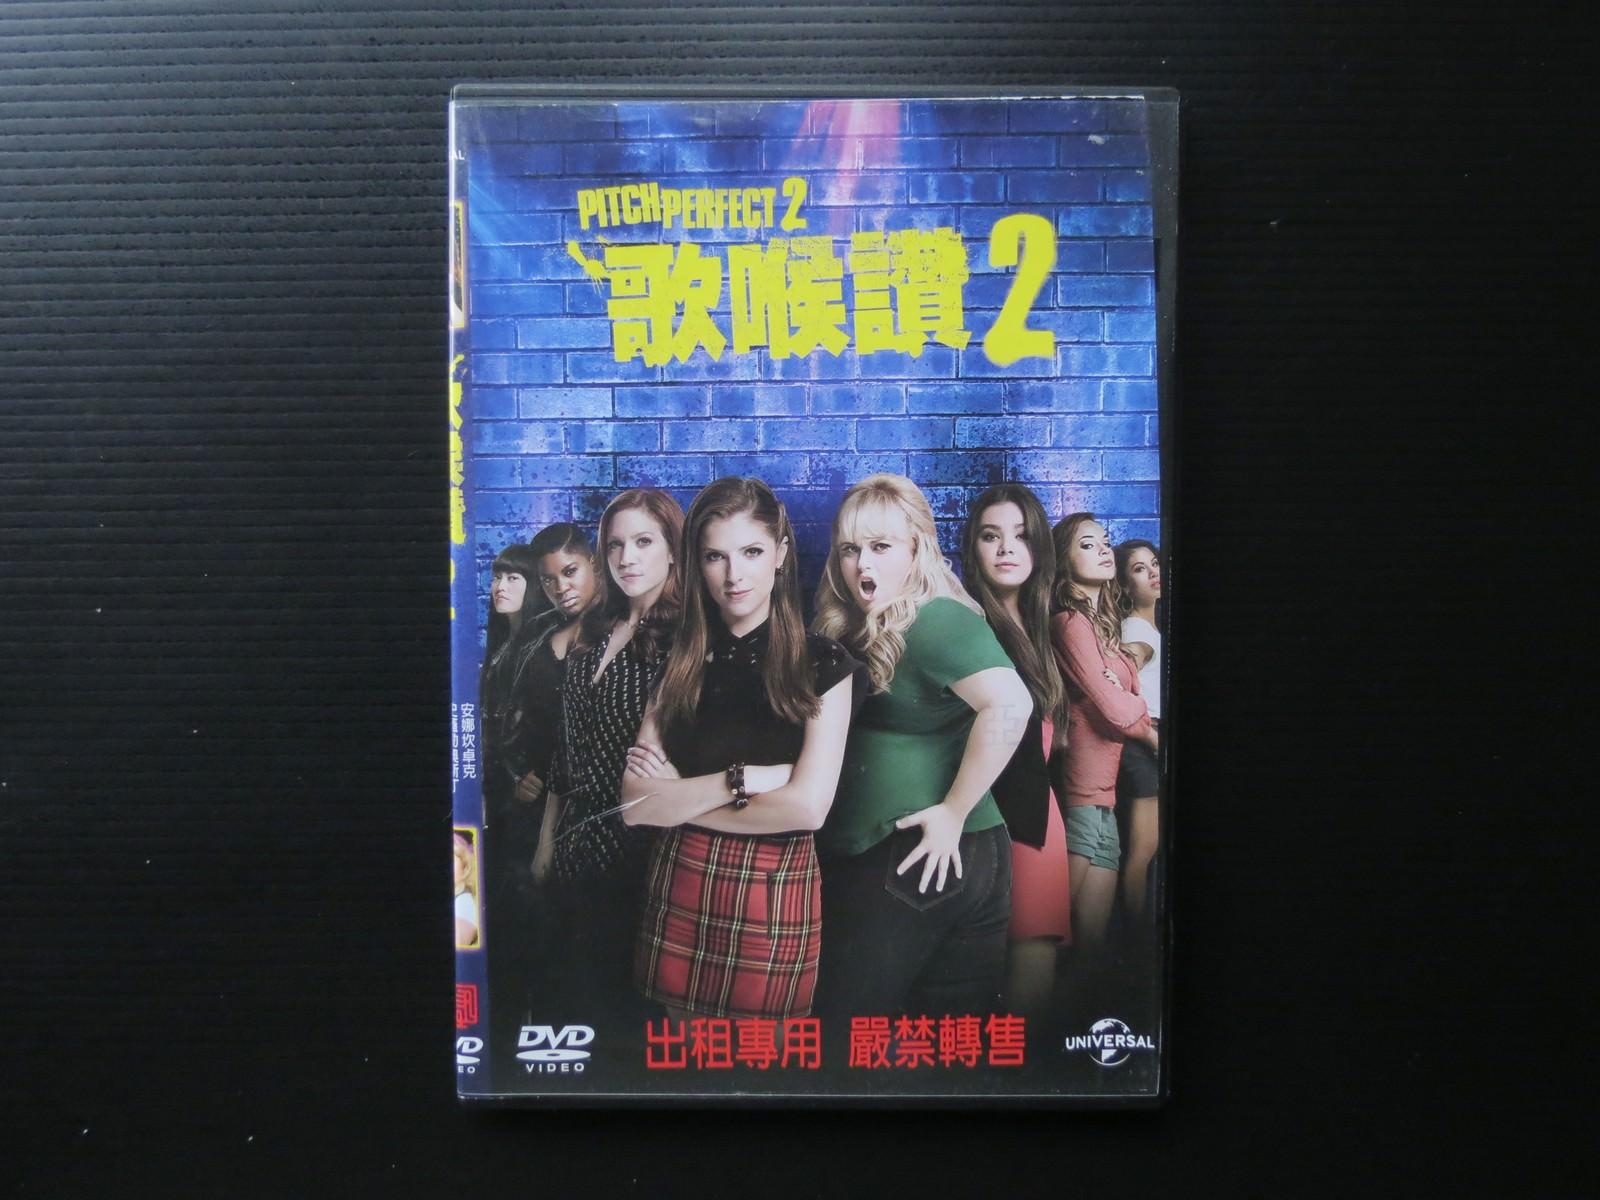 Movie, Pitch Perfect 2(美國, 2015) / 歌喉讚2(台灣) / 完美音调2(中國) / 完美巨聲幫(香港), 電影DVD